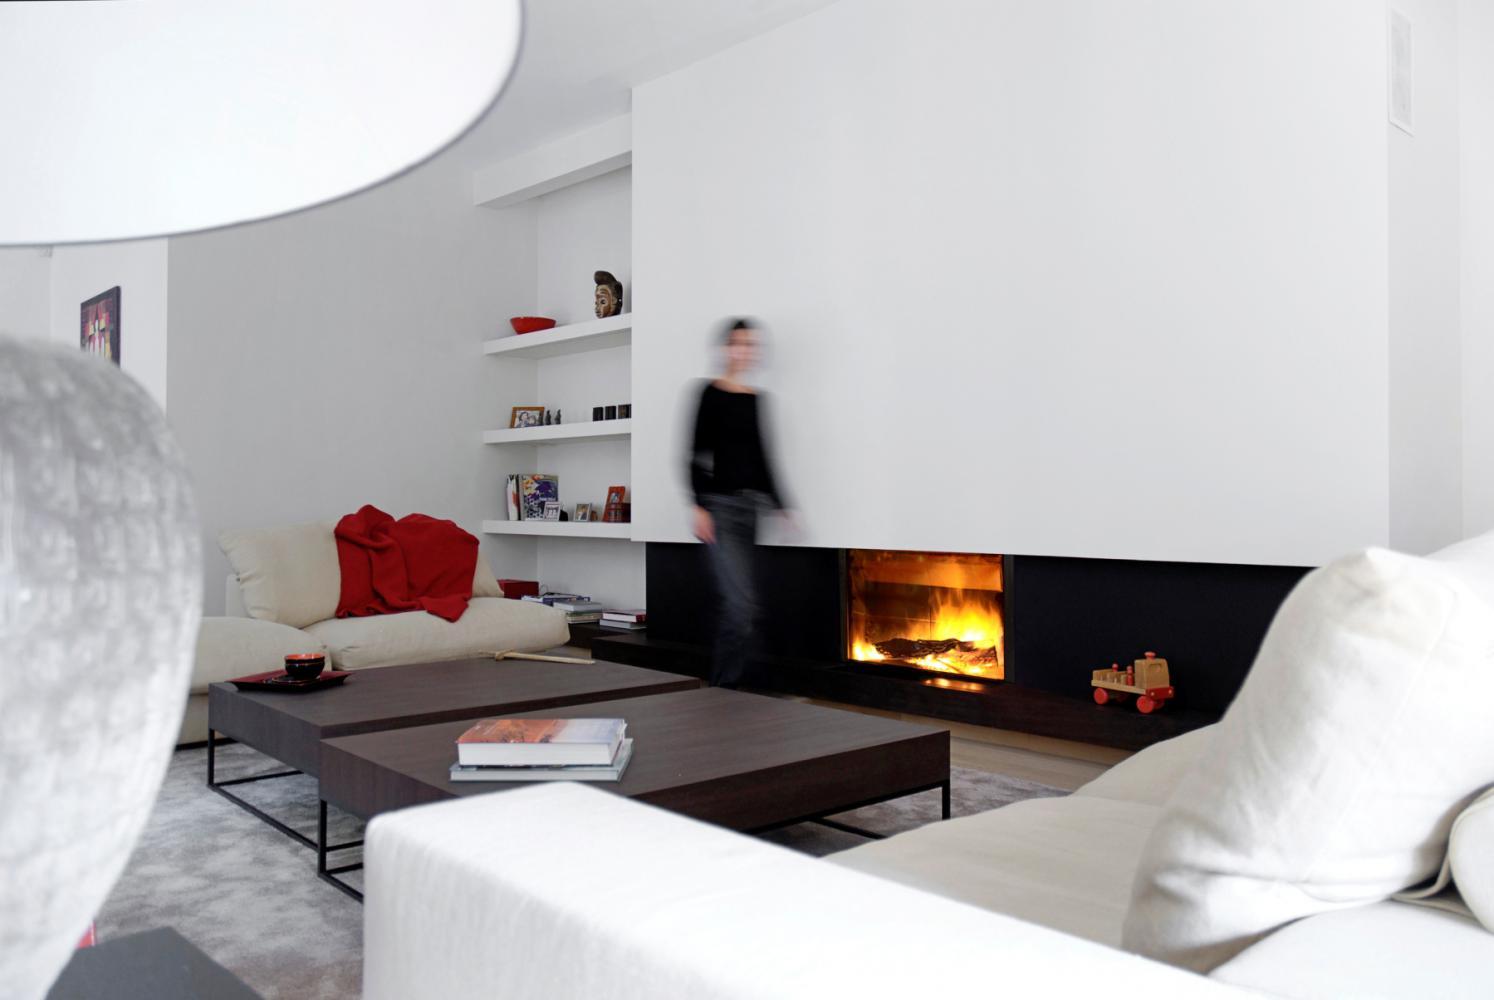 wood inset stove fire stuv 21-95 | Stûv